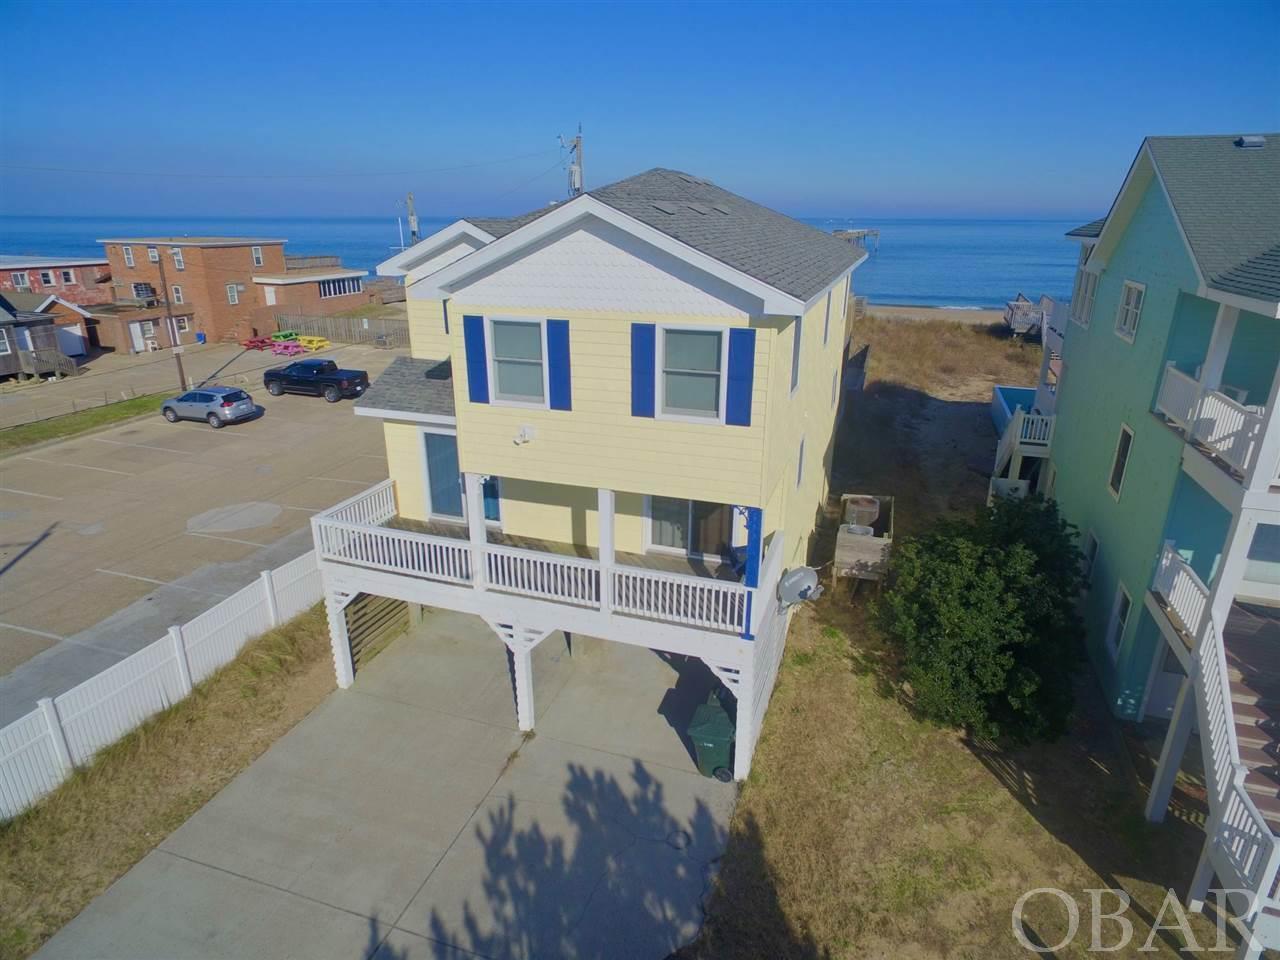 oceanfront homes for sale on the outer banks matt huband obx rh obxrealtygroup com